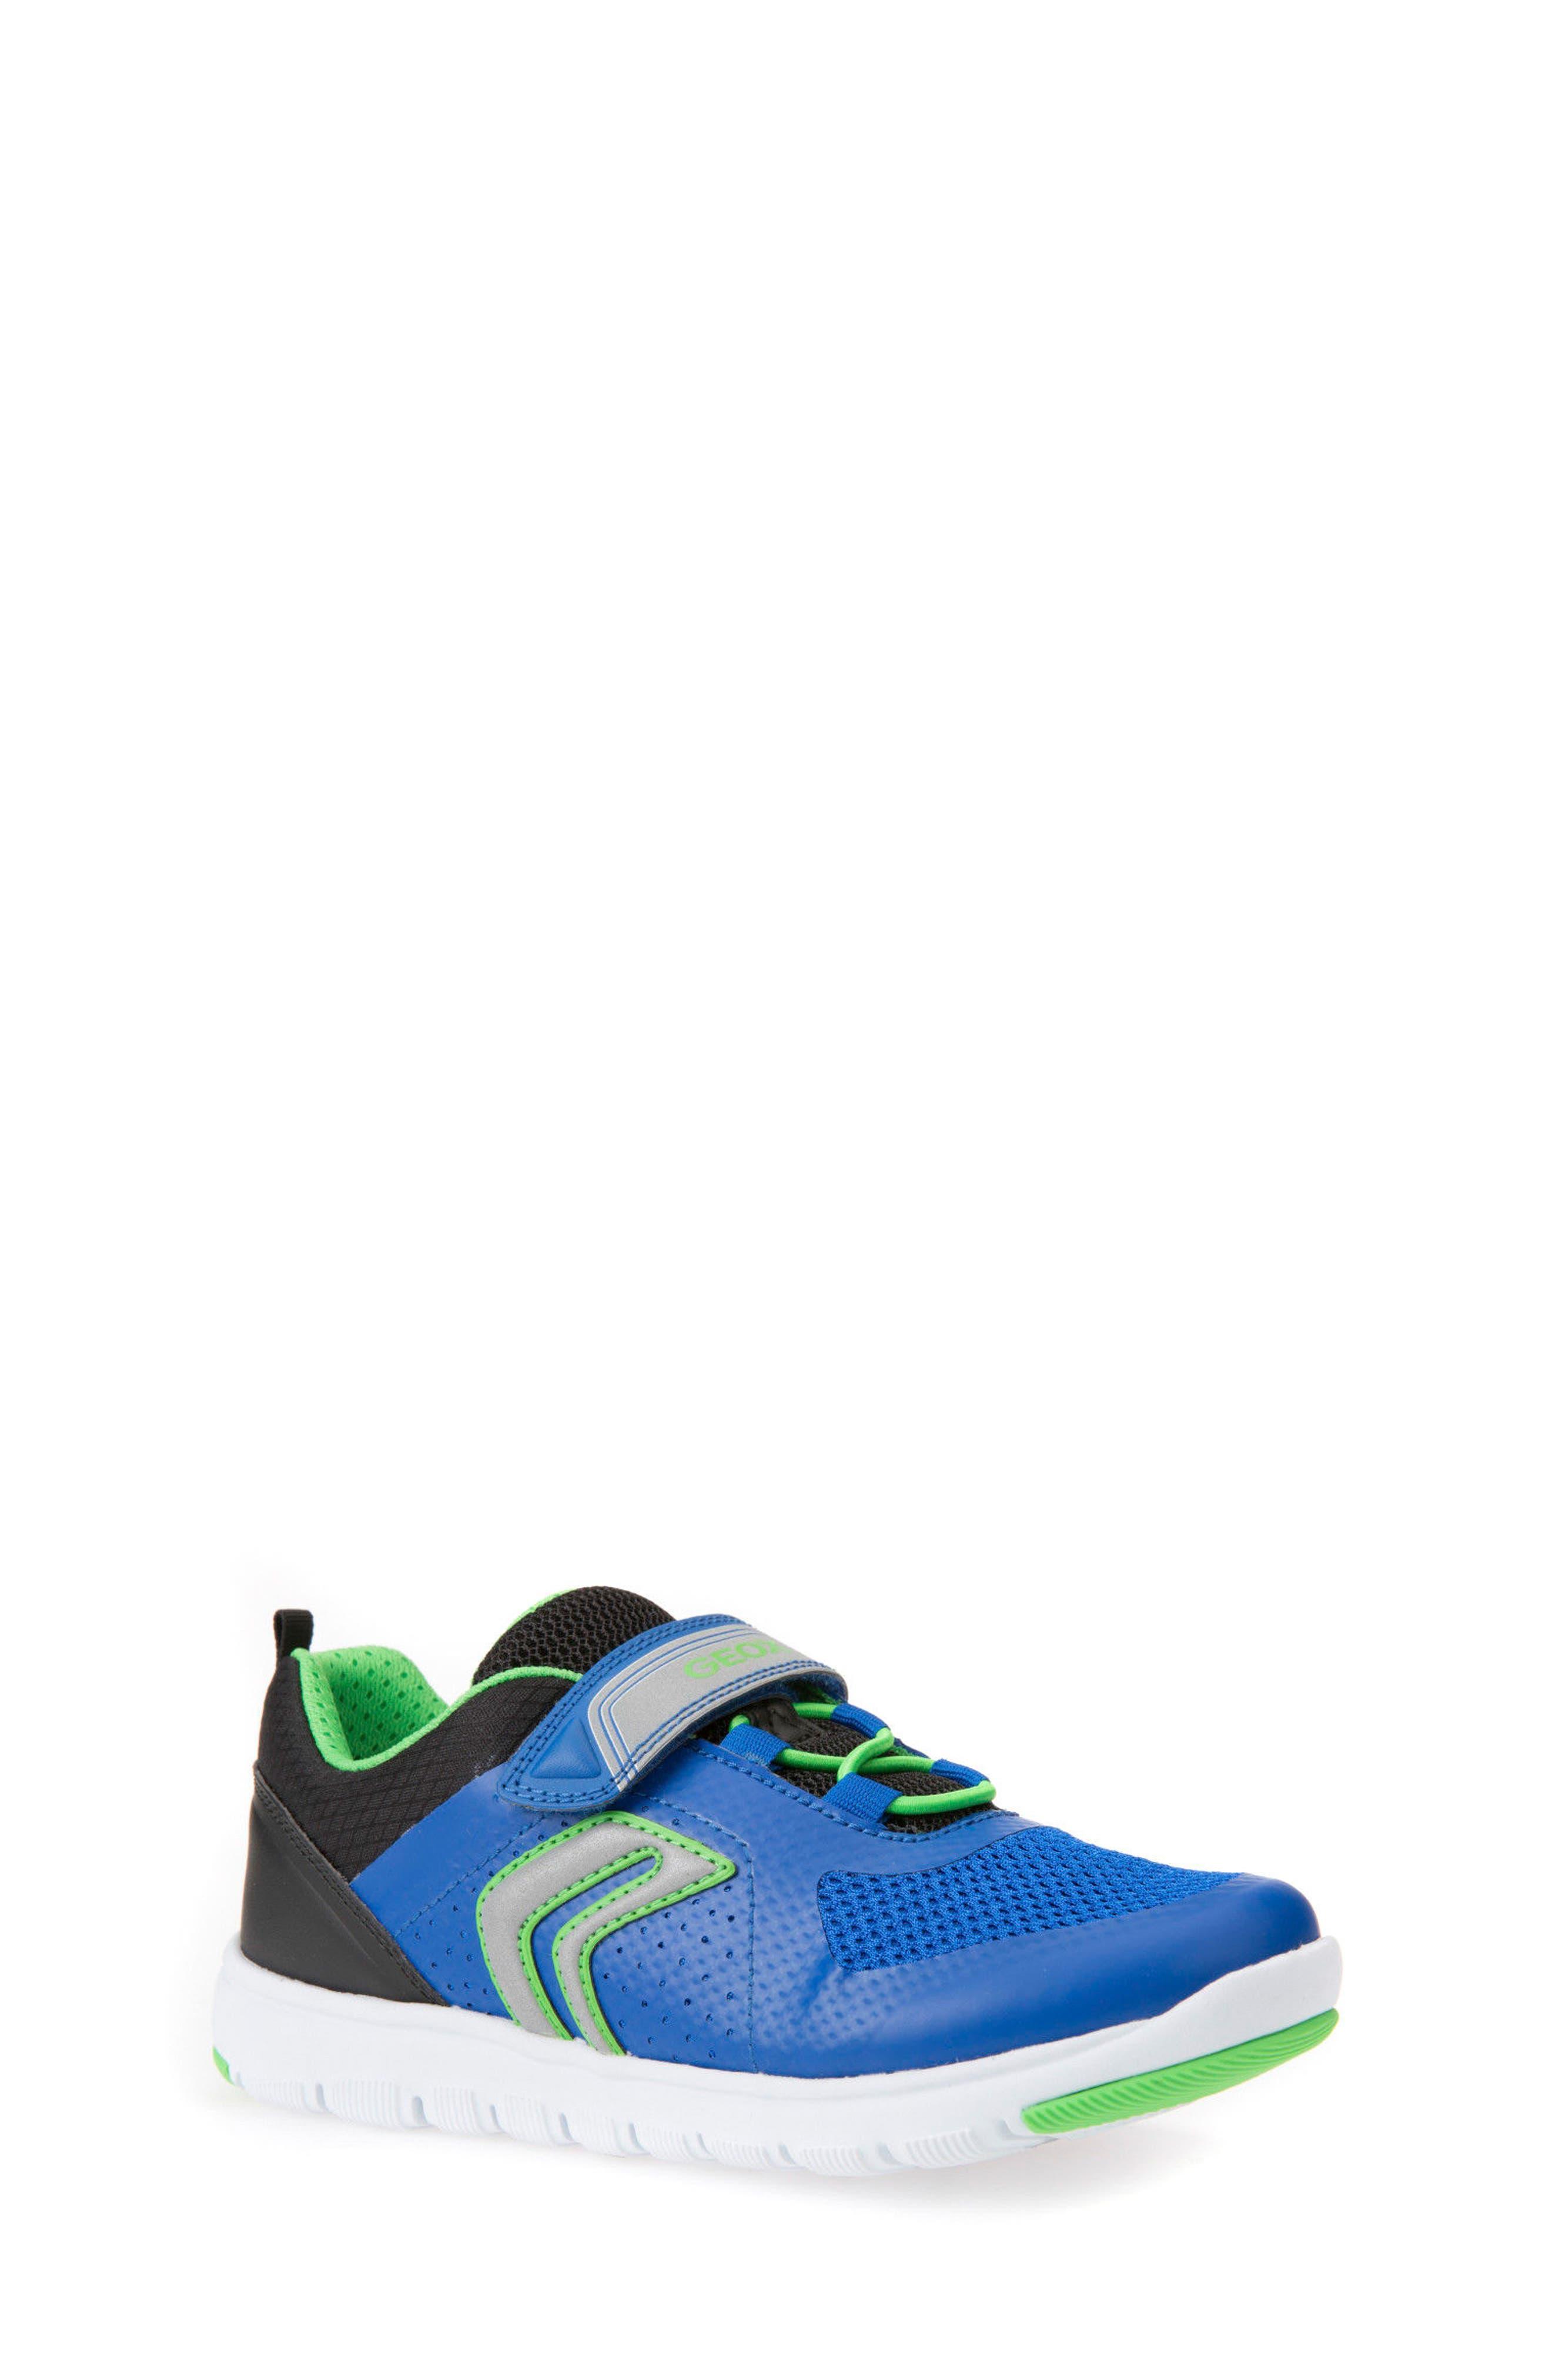 Main Image - Geox Xunday Low Top Sneaker (Toddler, Little Kid & Big Kid)